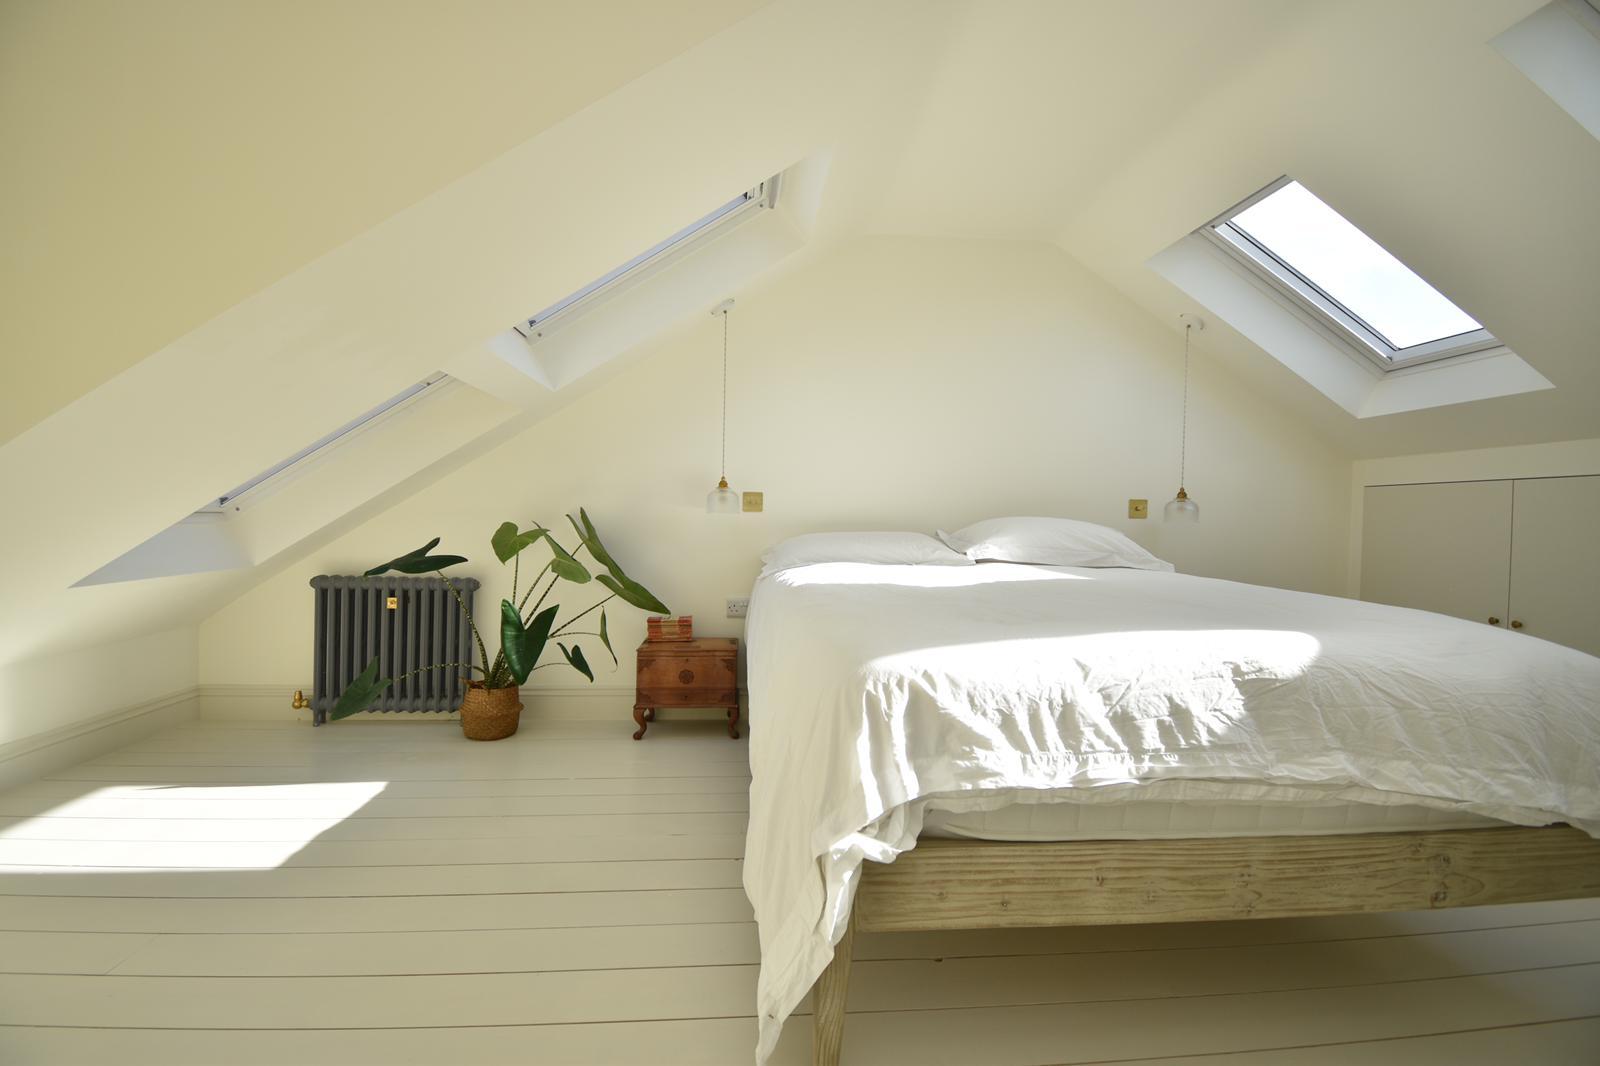 loft conversion bedroom sloped ceiling